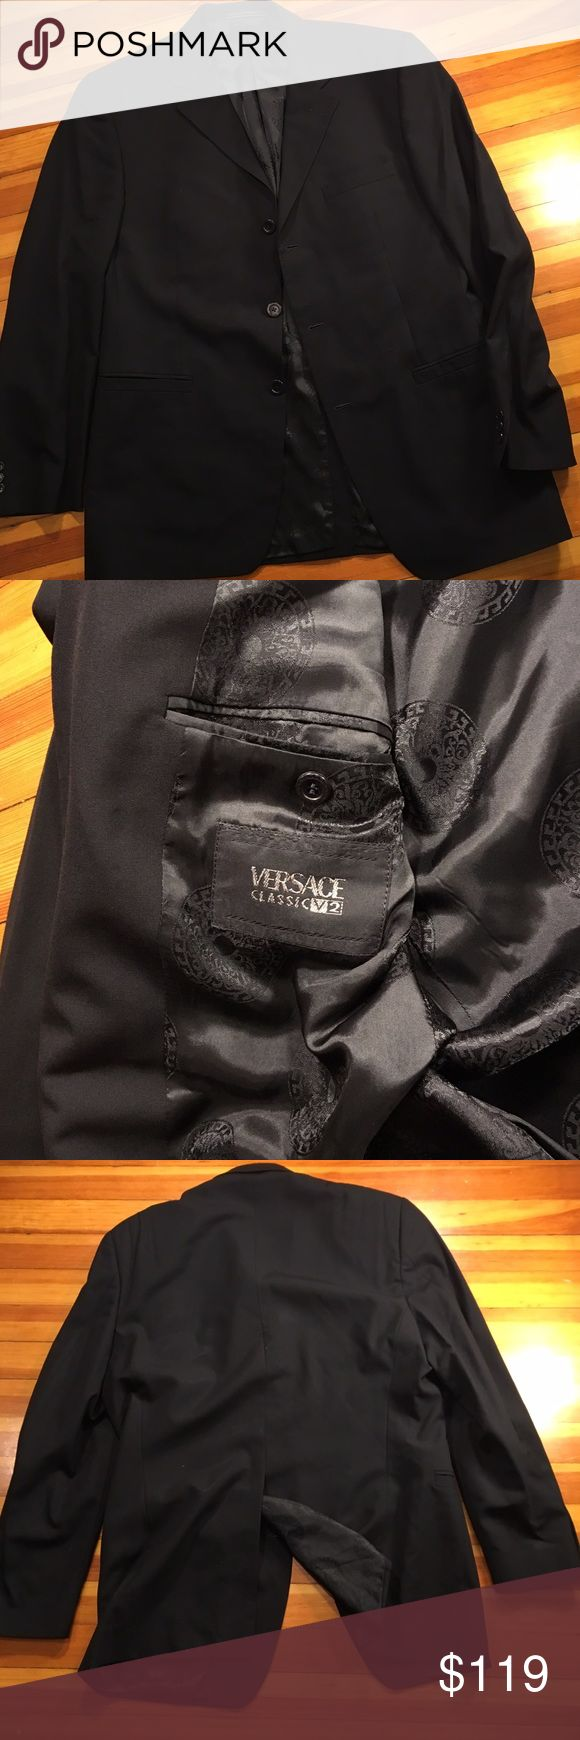 50R Versace V2 2-Button Sport Coat Mint condition 50R Versace V2 2-Button Sport Coat Versace Suits & Blazers Sport Coats & Blazers